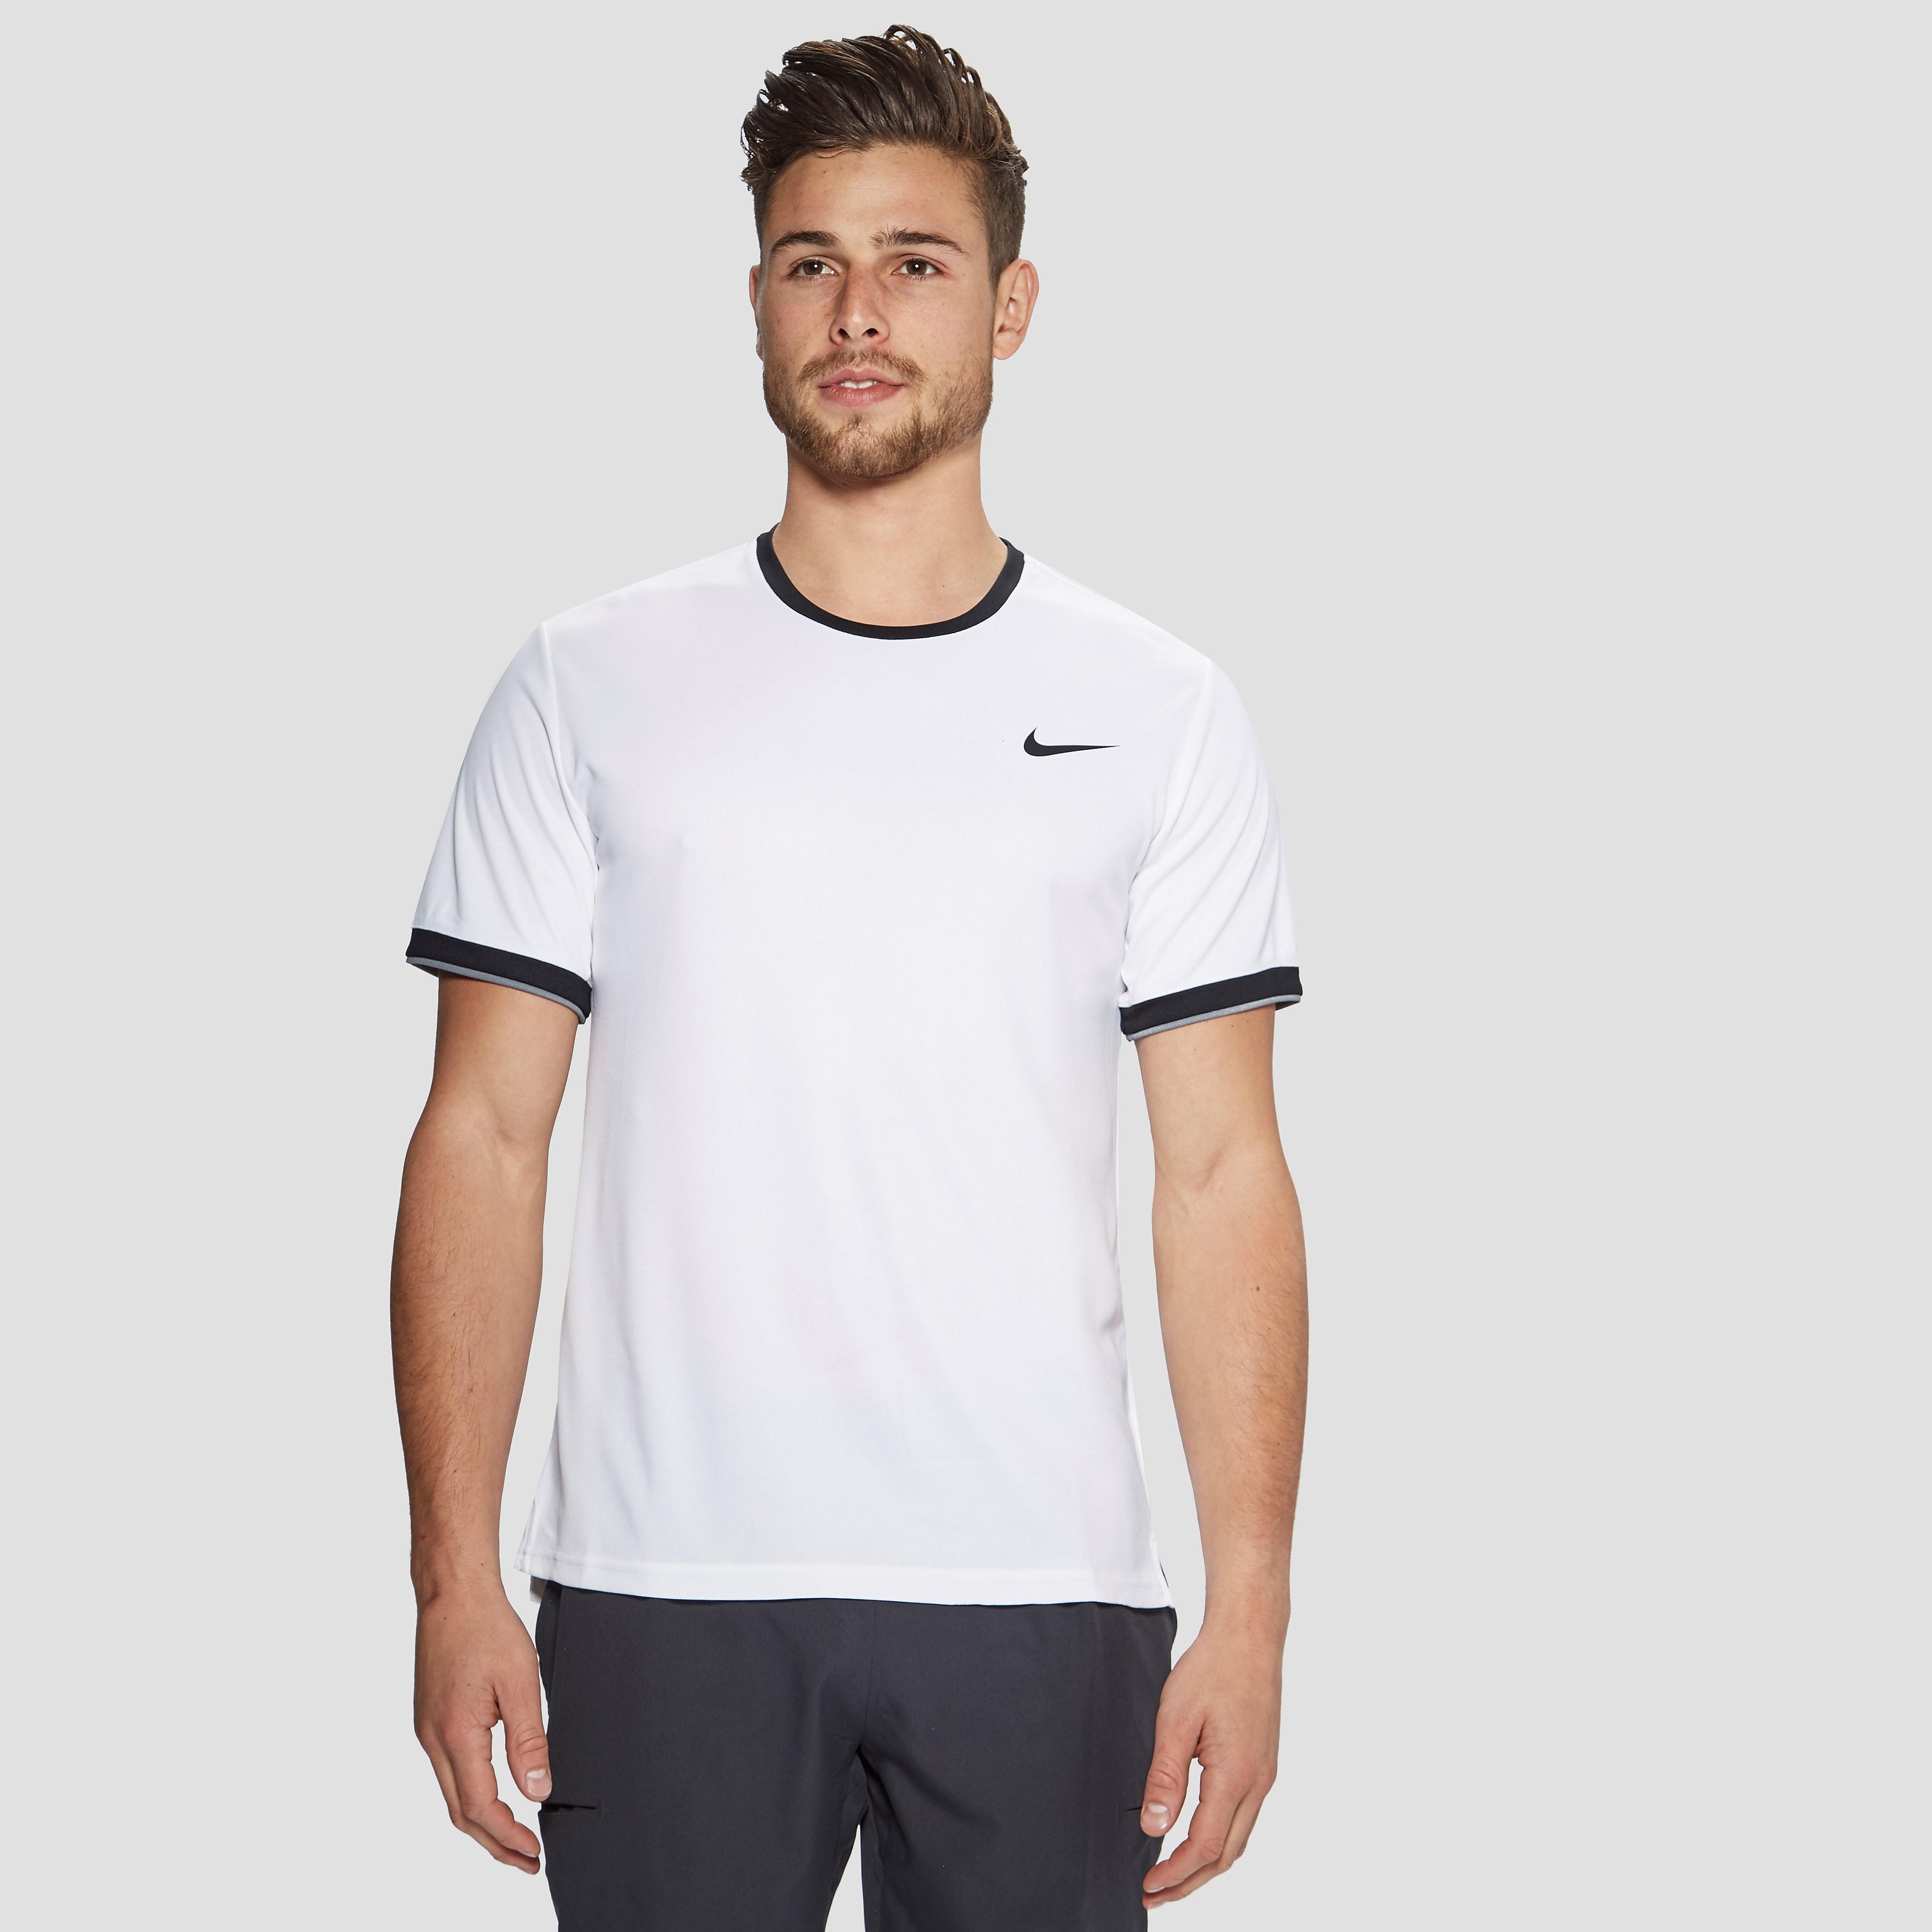 Nike Dry Team Men's Tennis Top